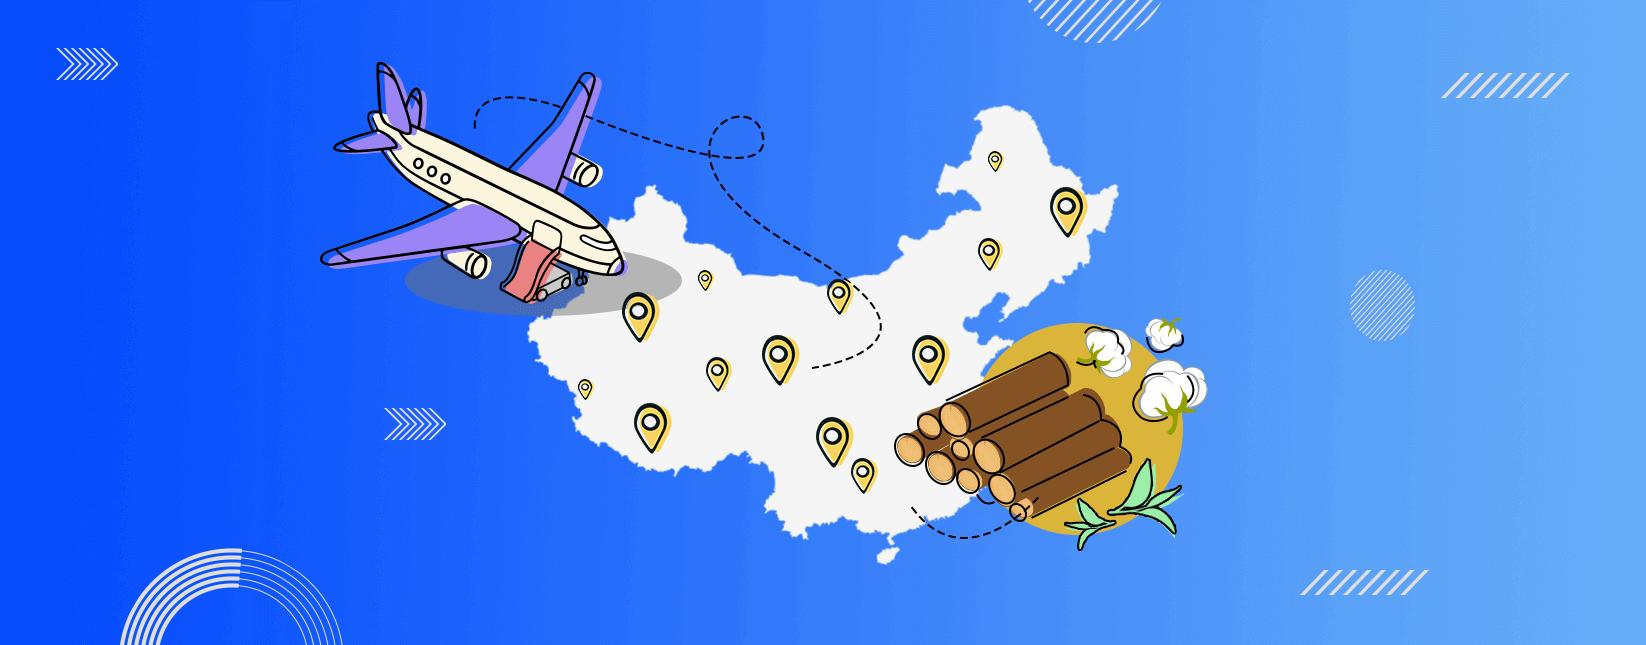 Top Cargo Handling China Airports